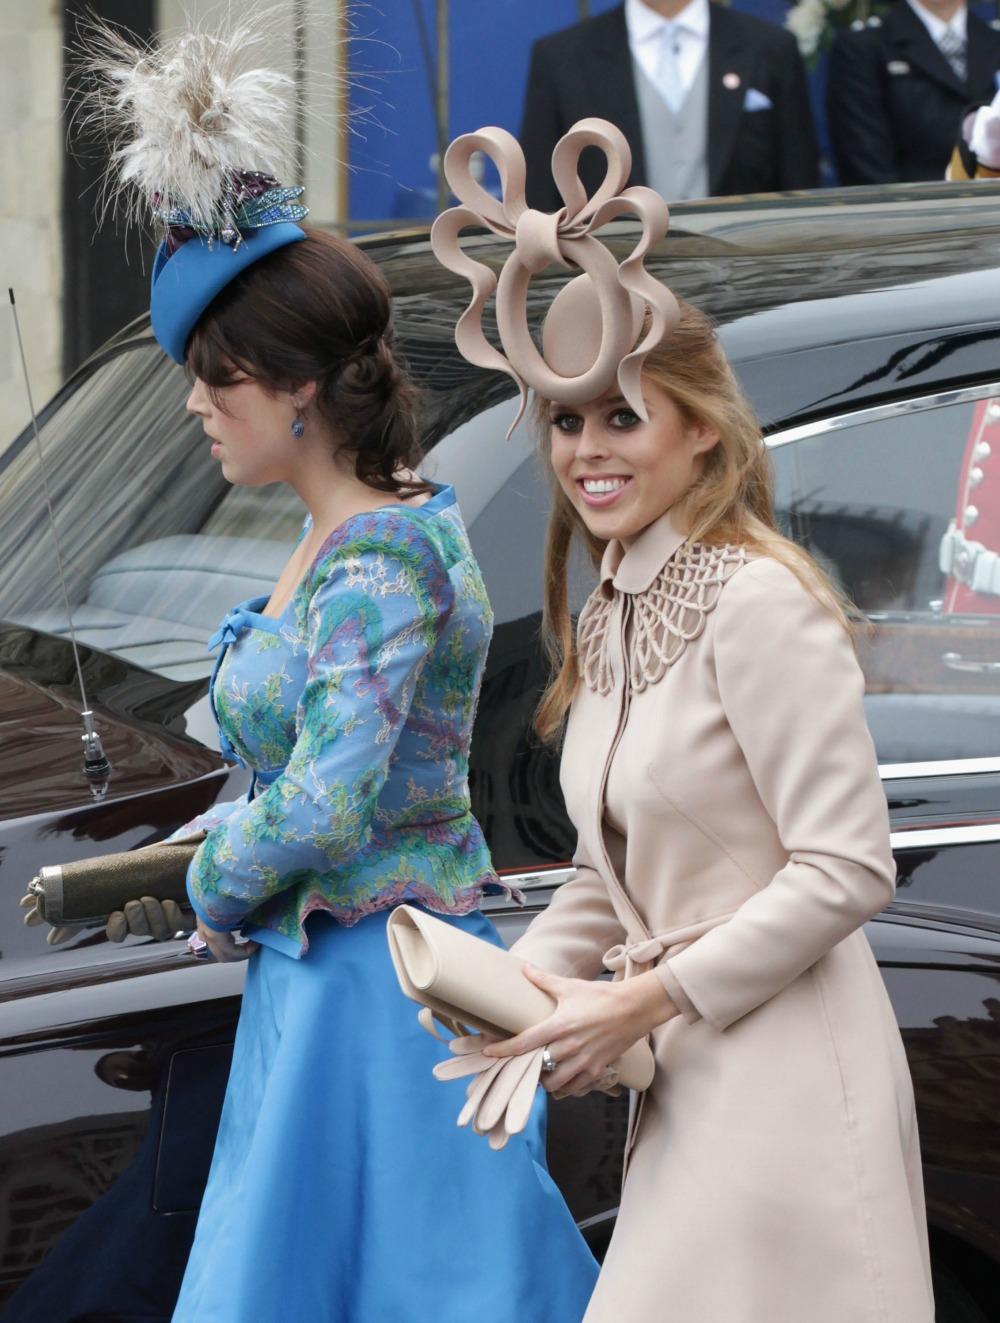 Princess Beatrice of The Royal Family rocks scandalous see